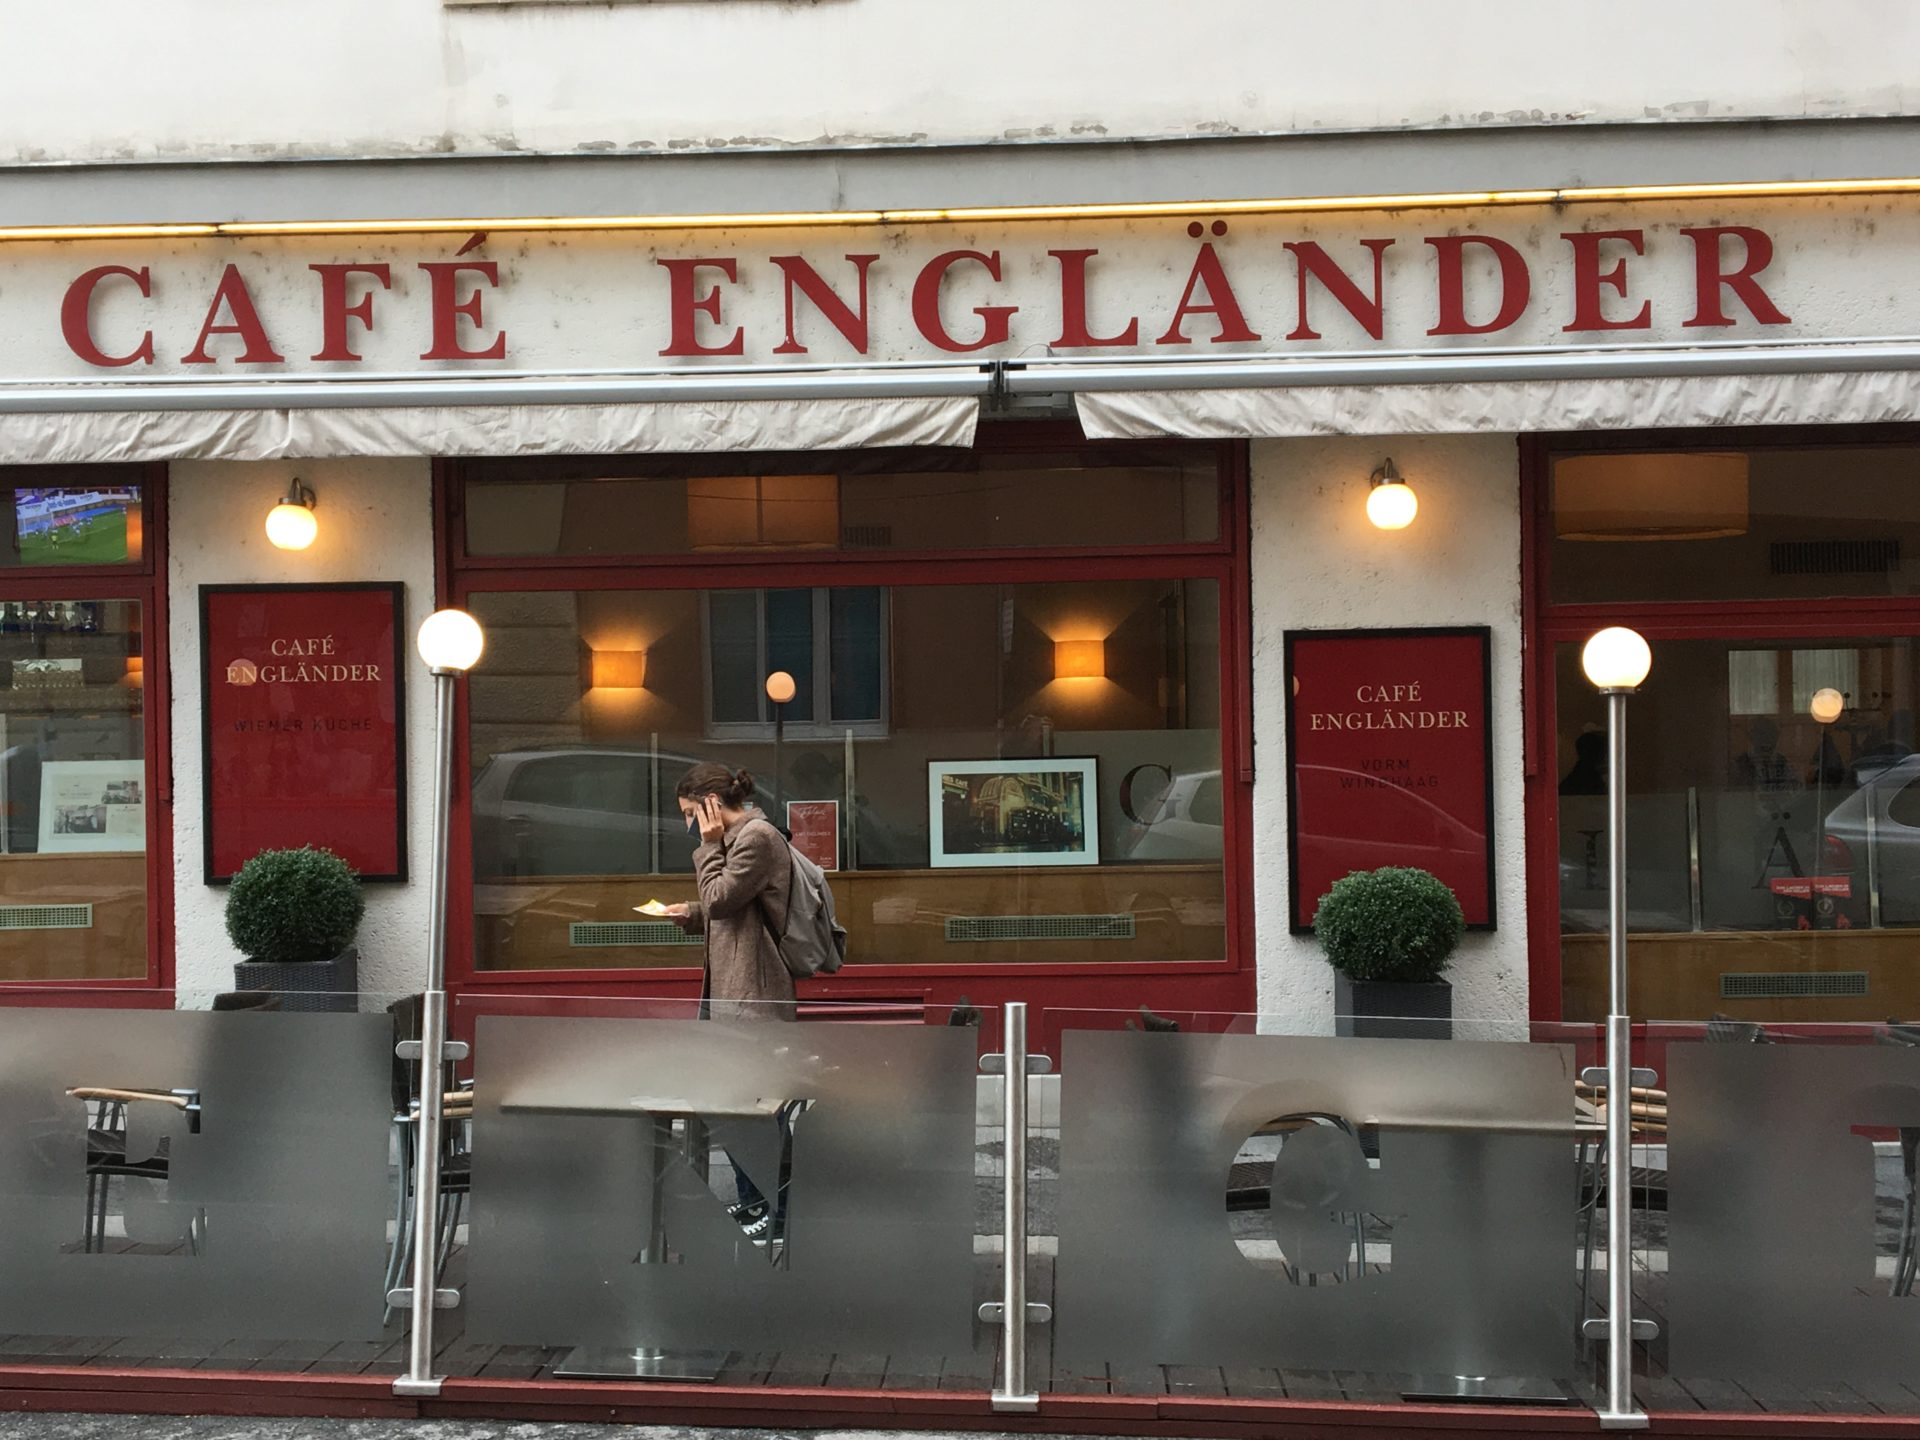 Cafe Englander, Vienna, Austria